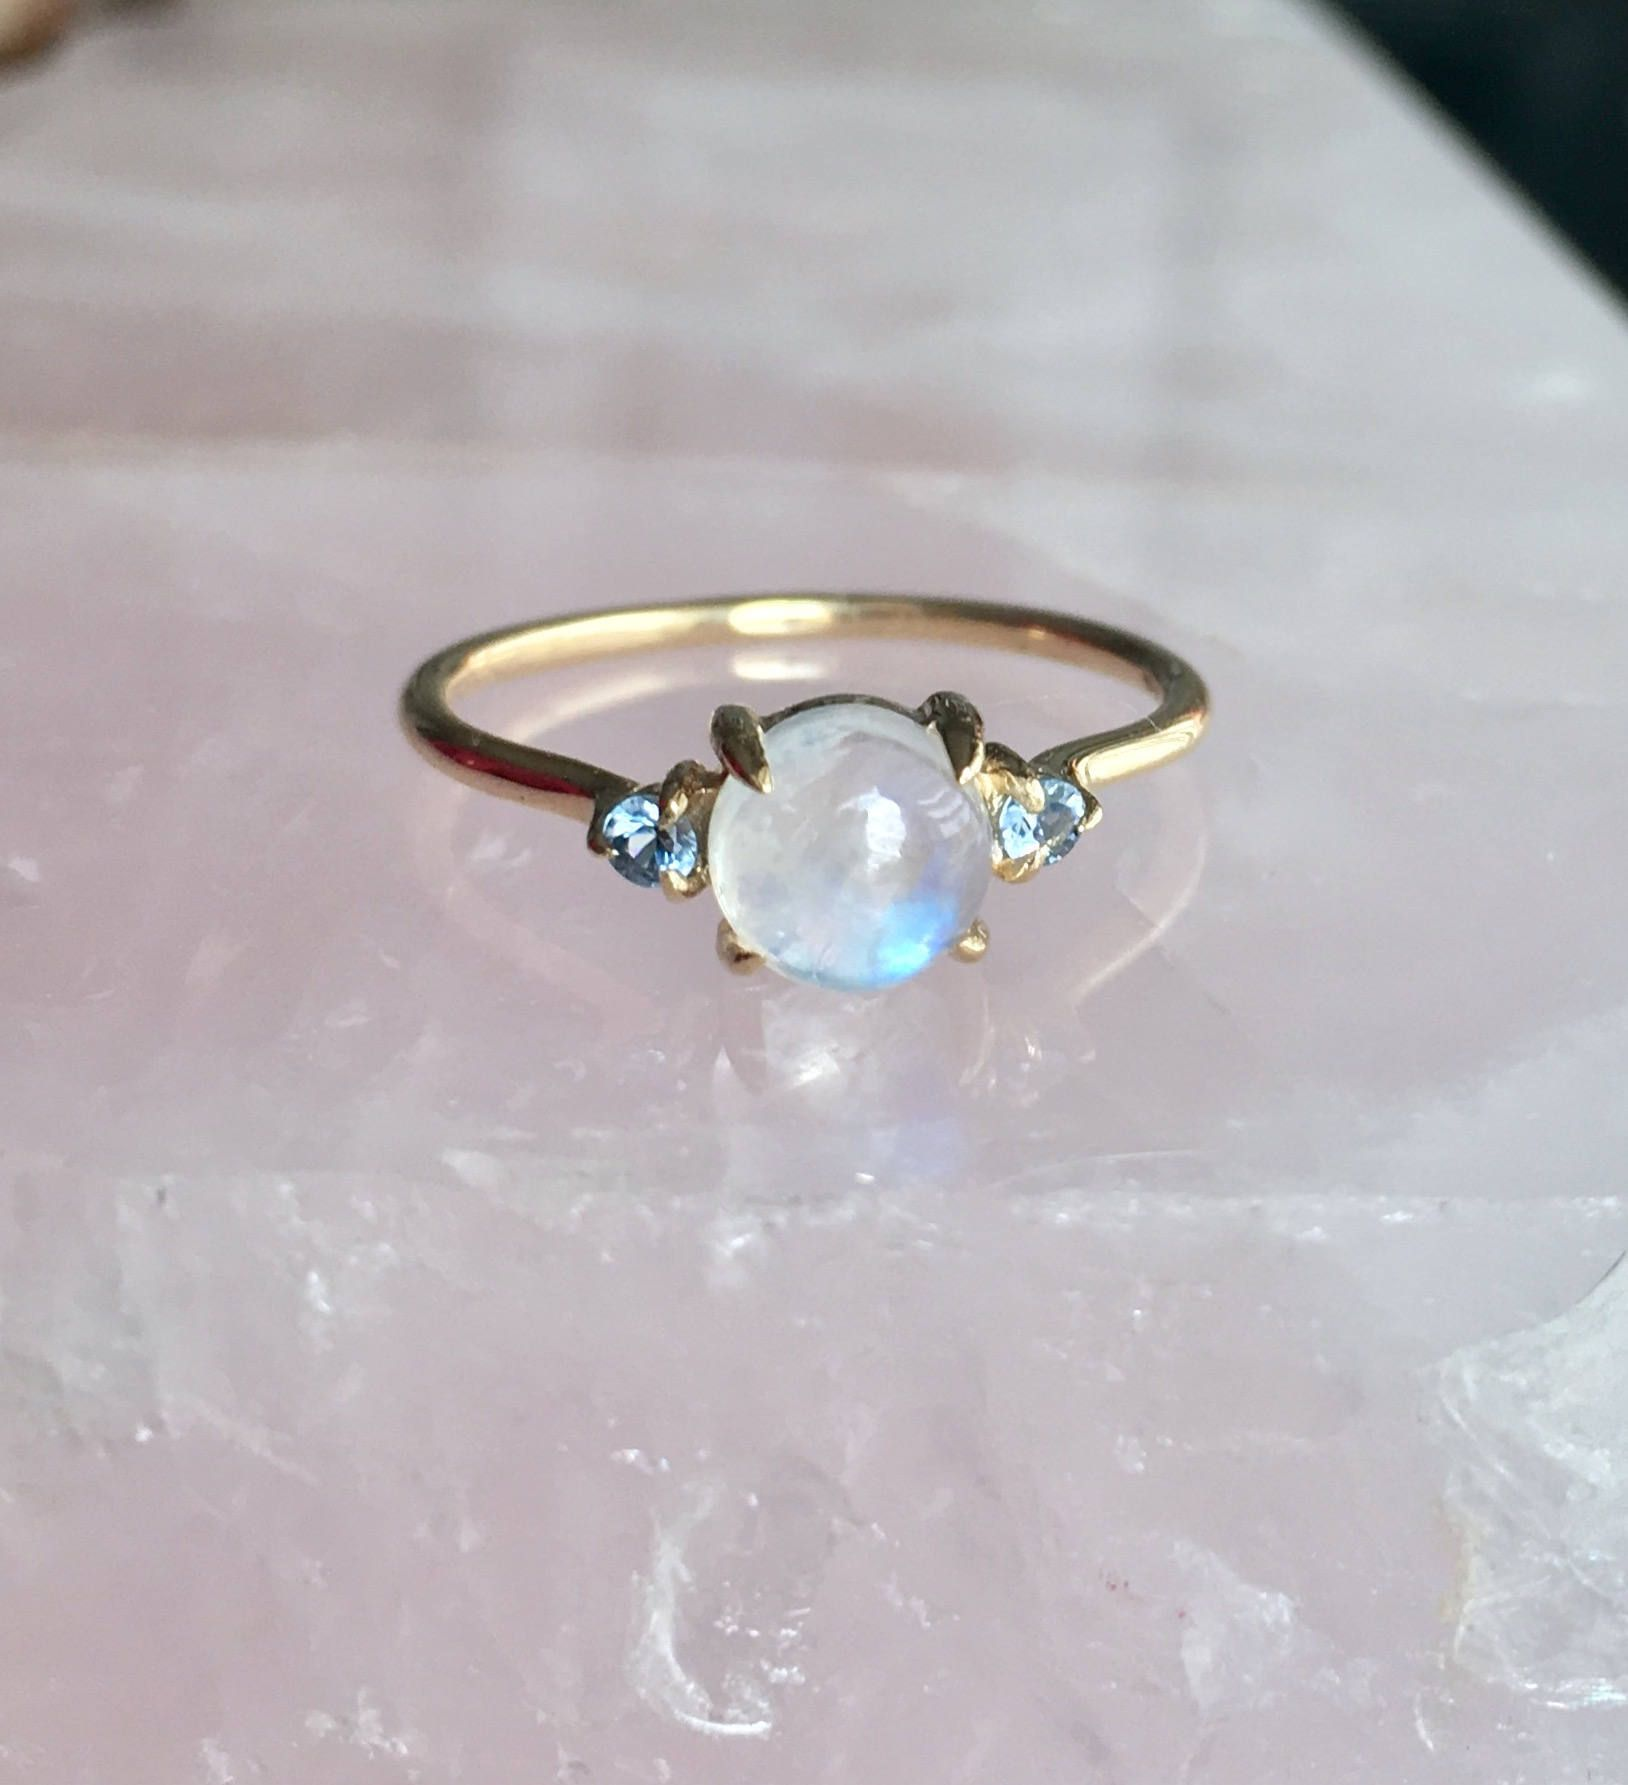 White Flower Ring Moonstone Ring Dainty Flower Ring Rainbow Moonstone Solid Silver Ring Flower Ring Daisy Ring Vintage Ring Sapphire